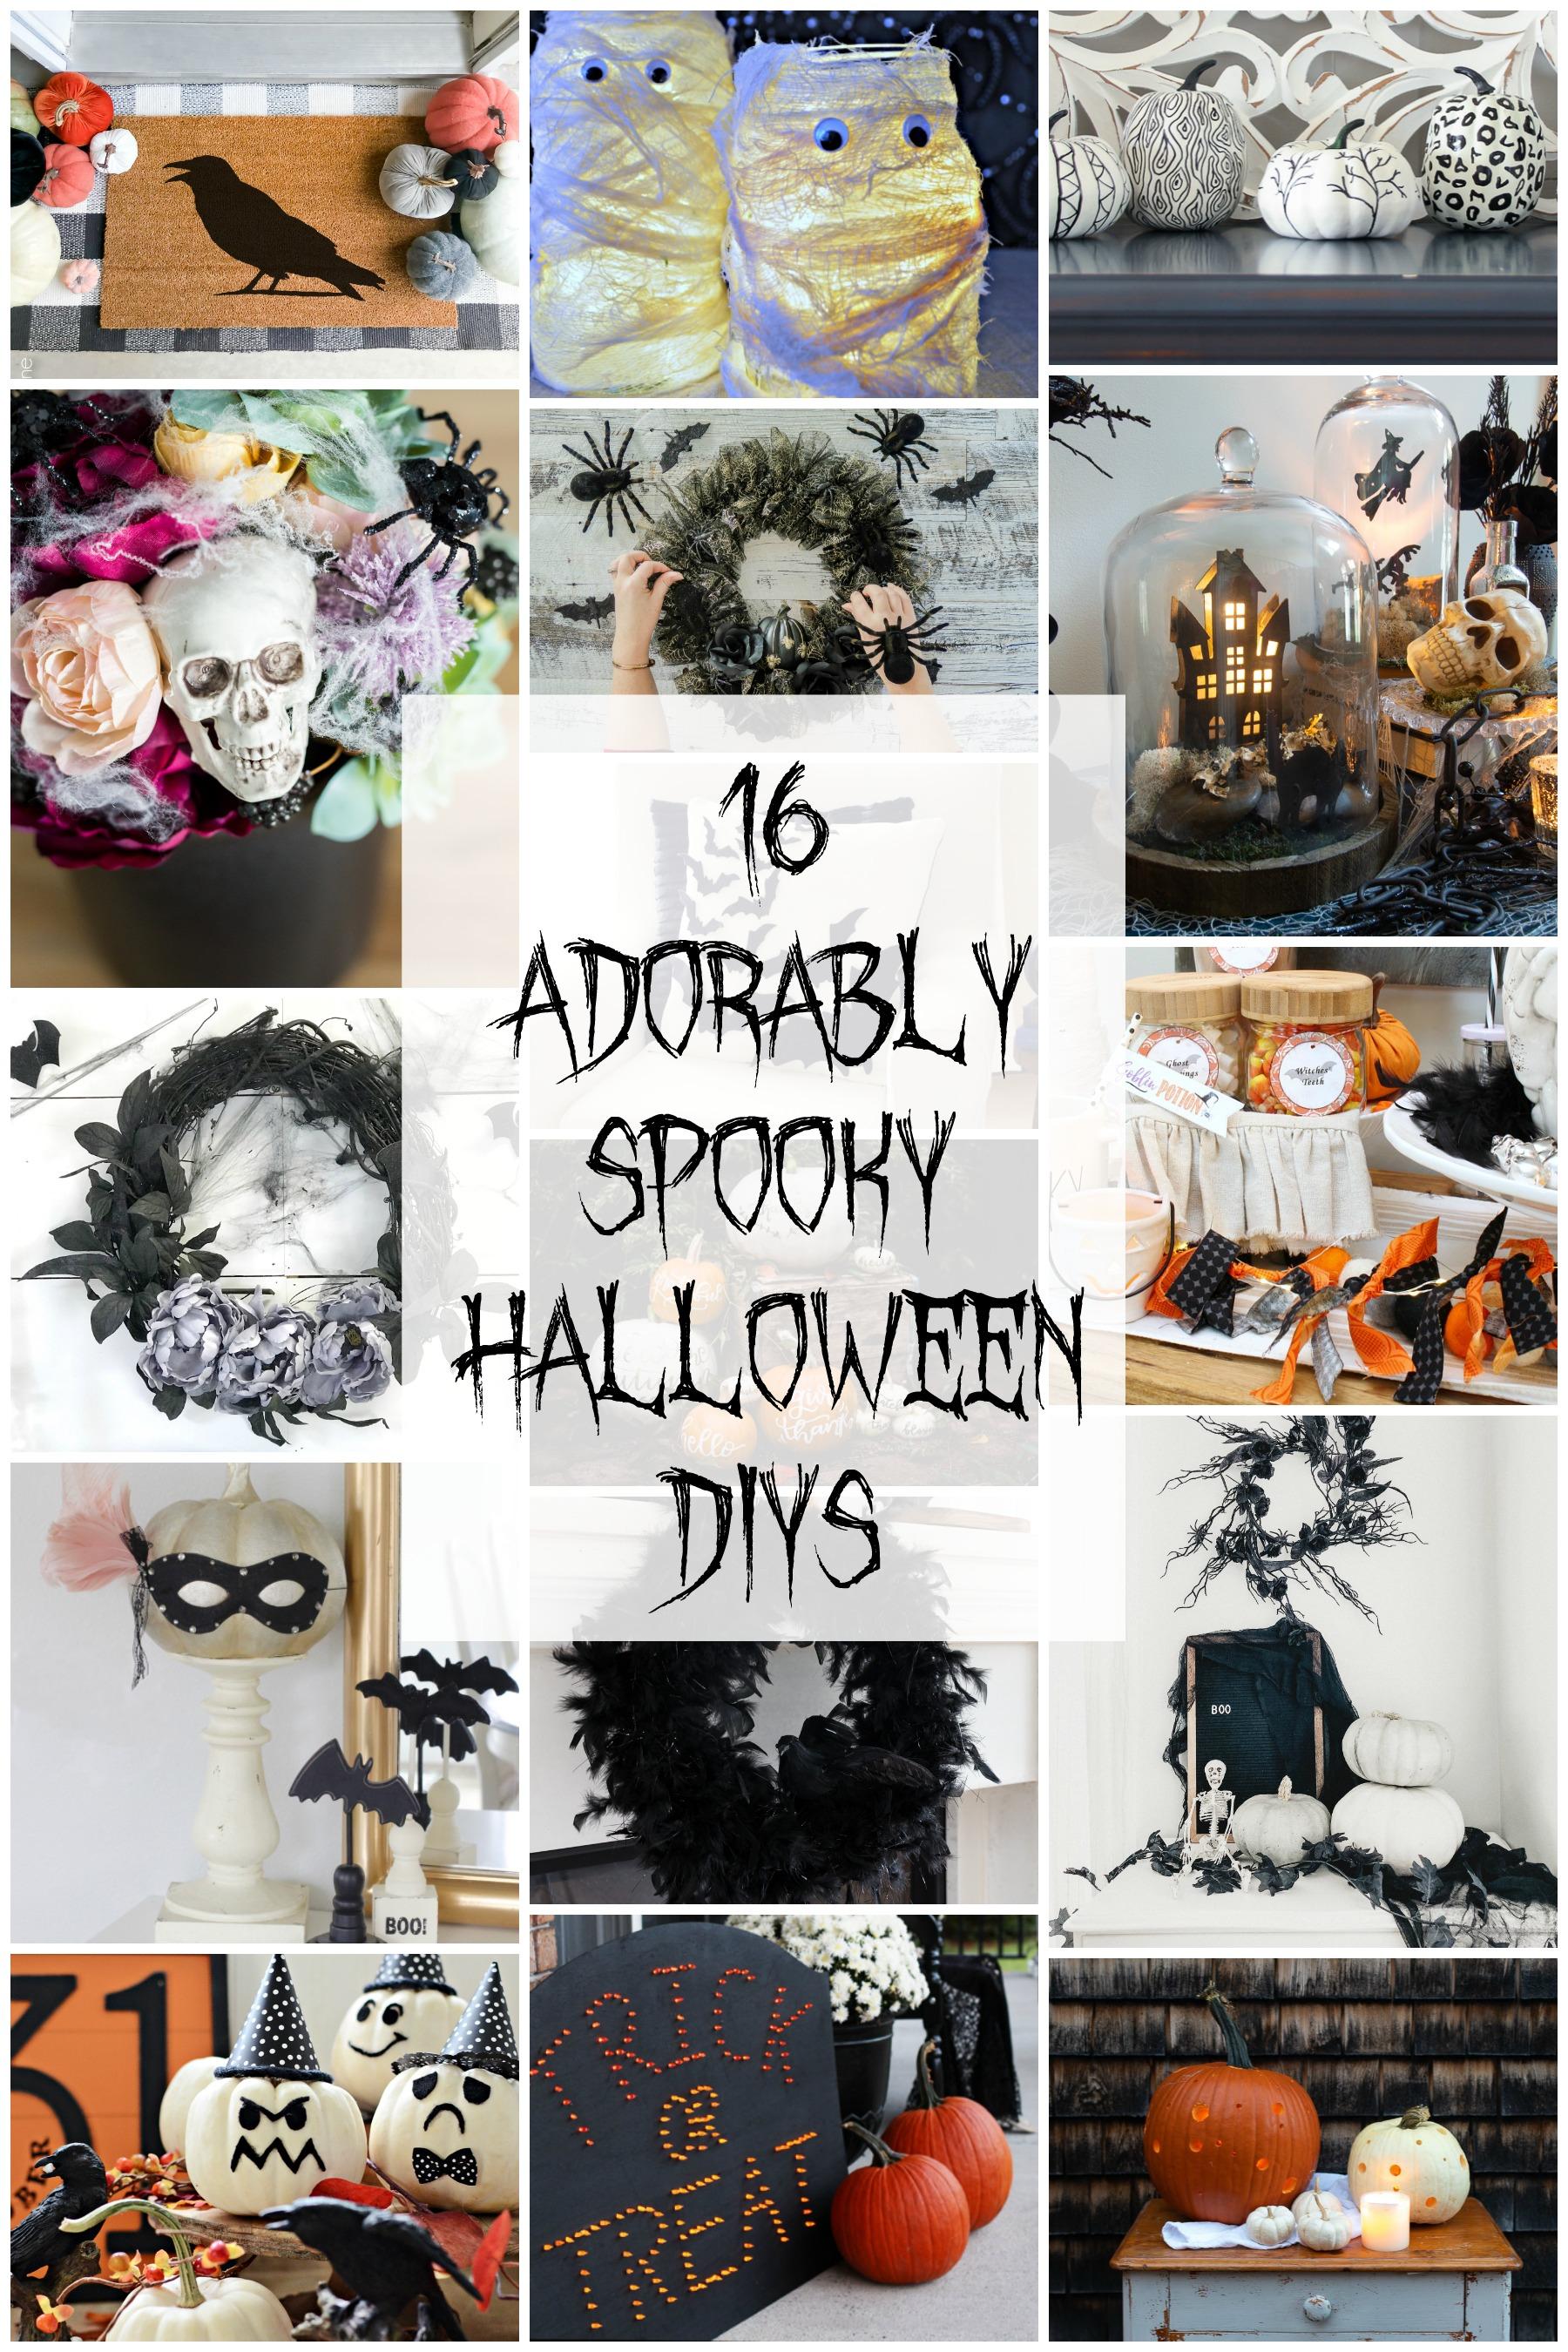 16 adorably spooky halloween DIYs